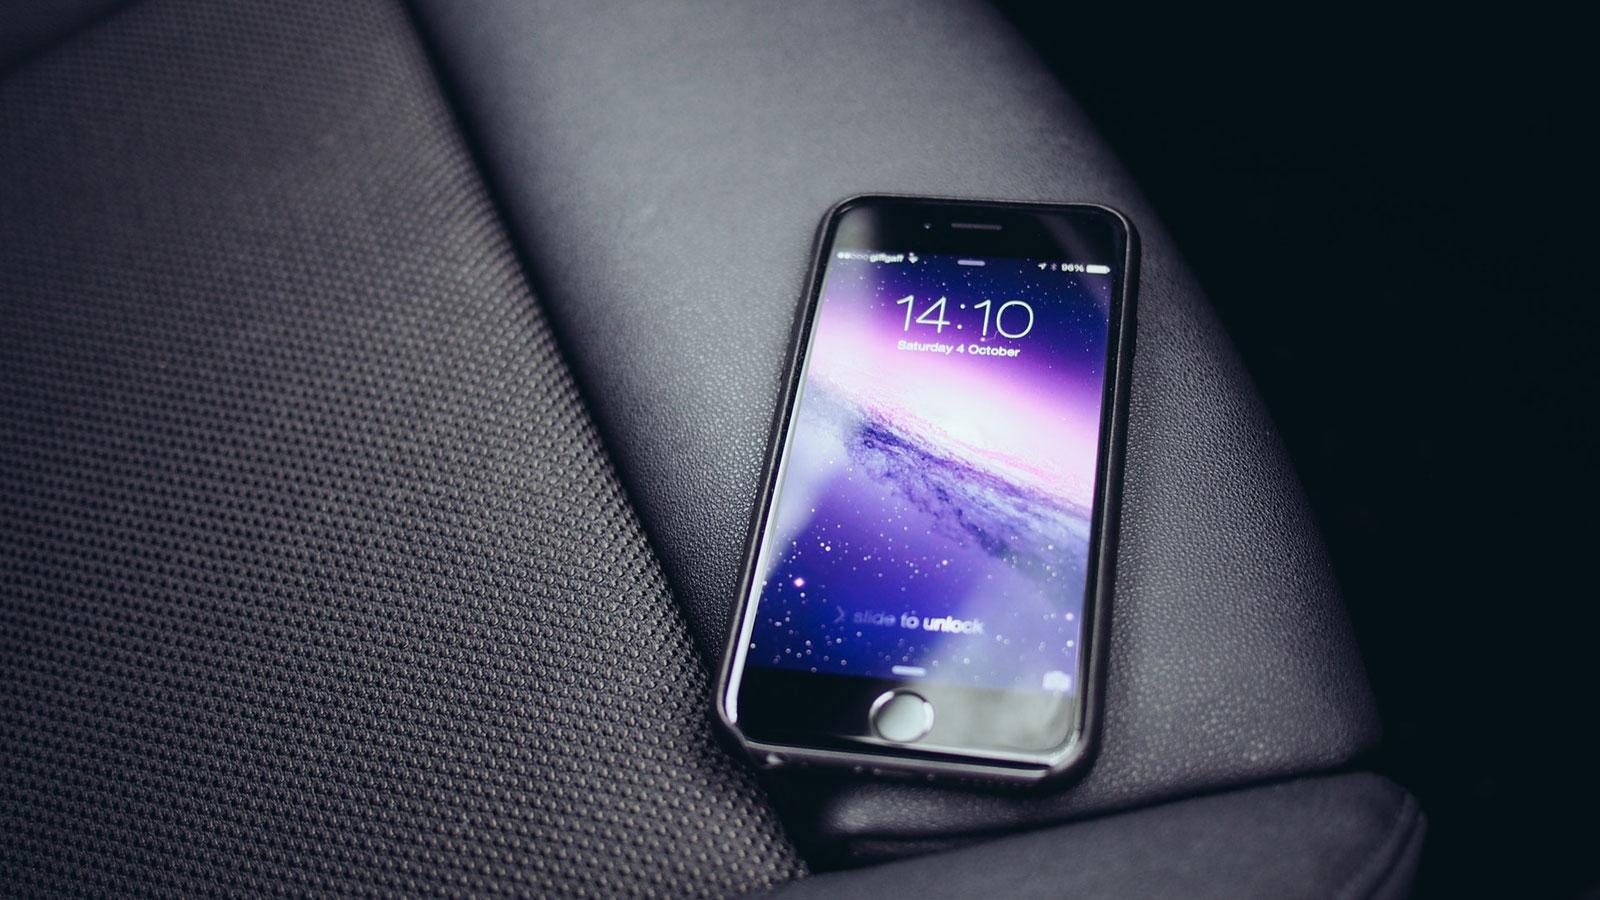 Iphone 4 apple id sperre umgehen